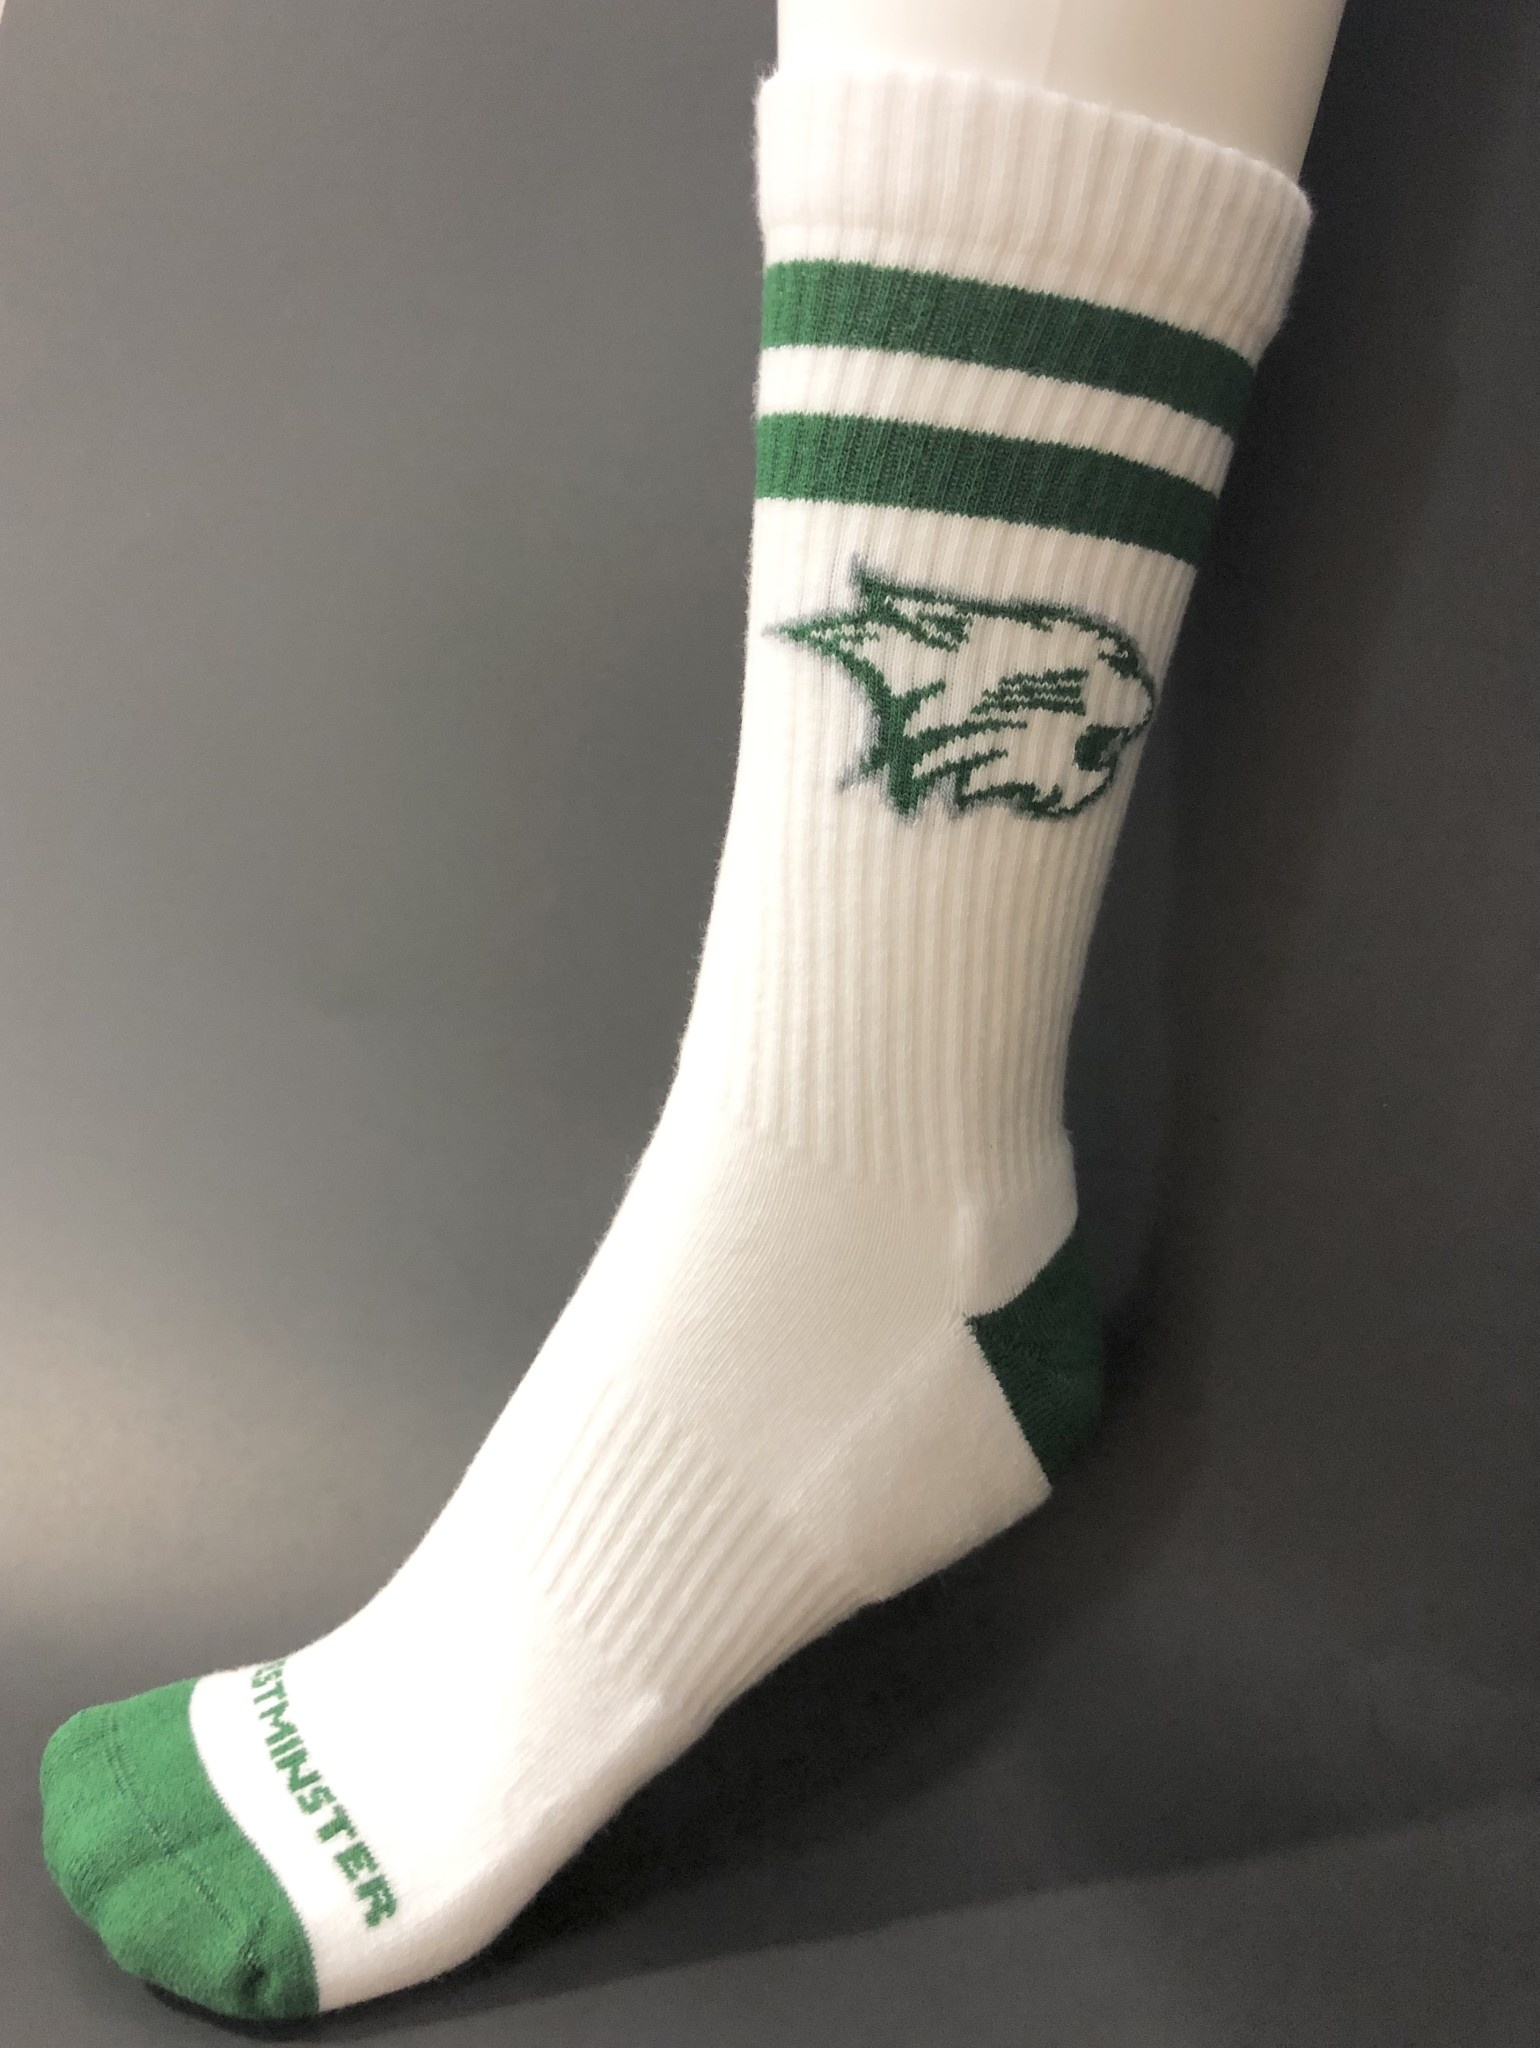 Socks: Athletic Striped High Crew